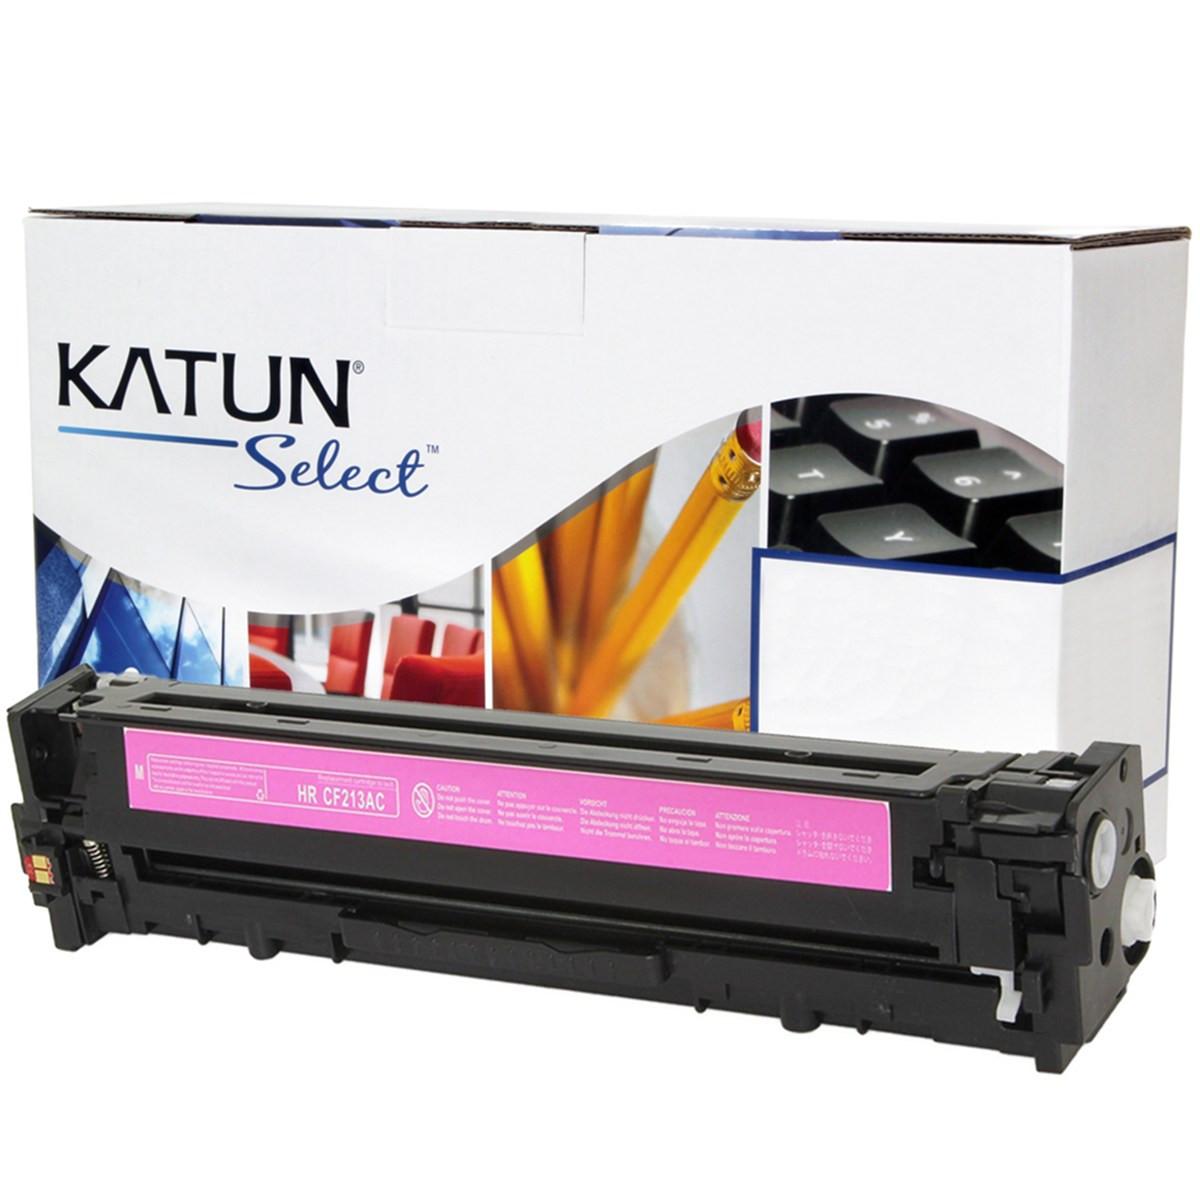 Toner Compatível com F213A 131A Magenta | Pro 200 276 M251NW M276N M276NW | Katun Select 1.8k